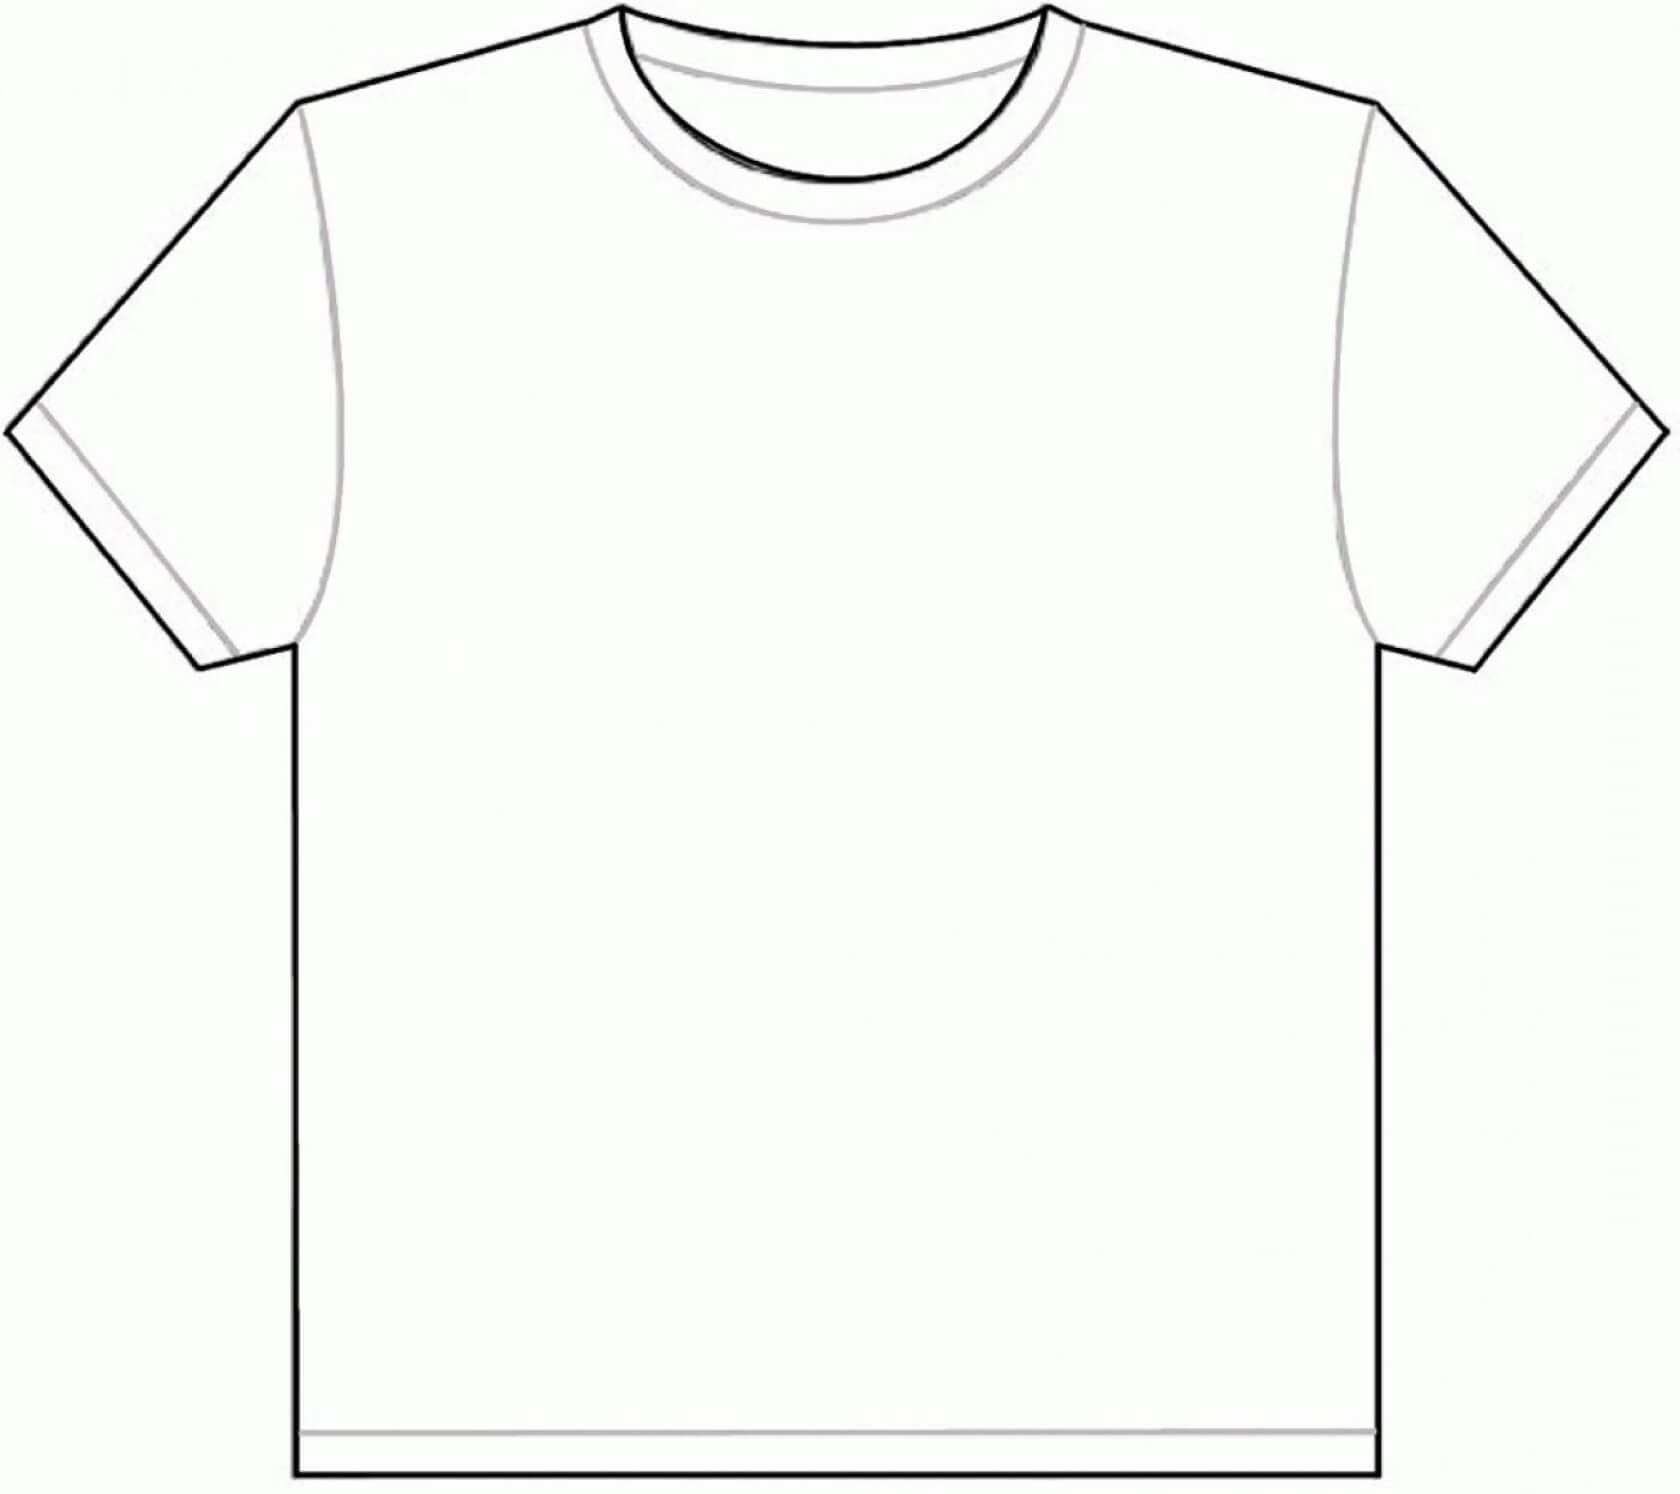 006 Blank Tee Shirt Template T Shirts Vector Beautiful Ideas Inside Blank Tee Shirt Template